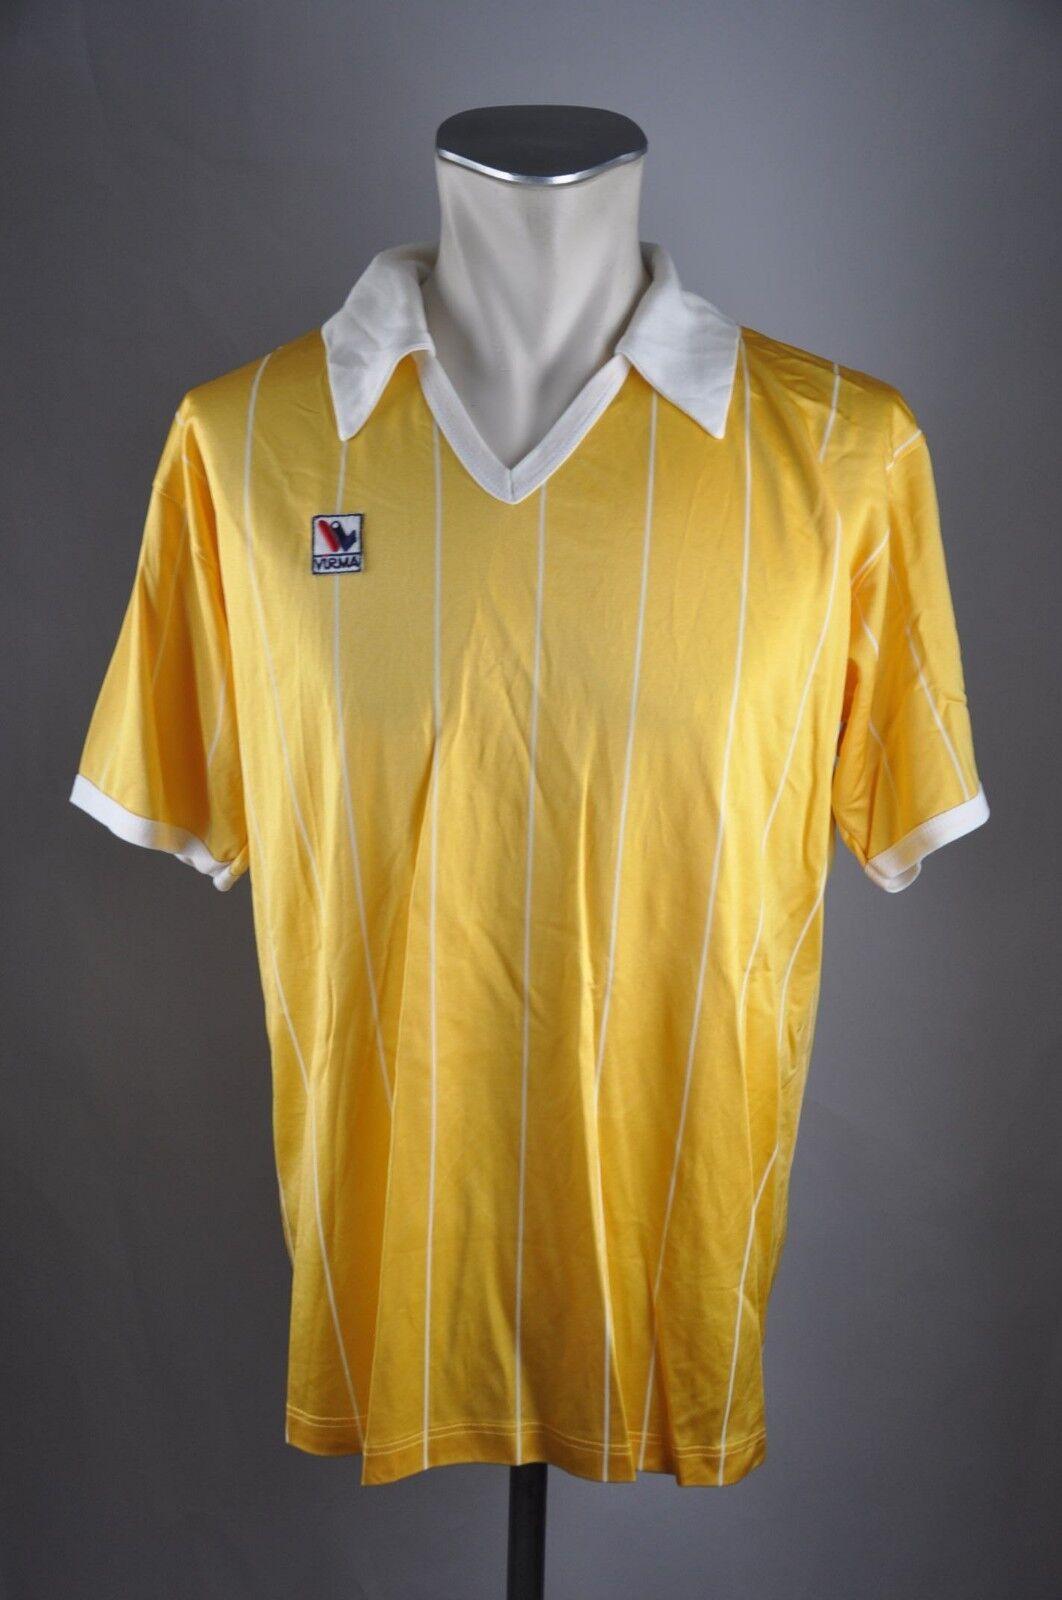 Virma vintage Shirt jersey Trikot 80er 80s Shirt  Gr. 5 - L VA6